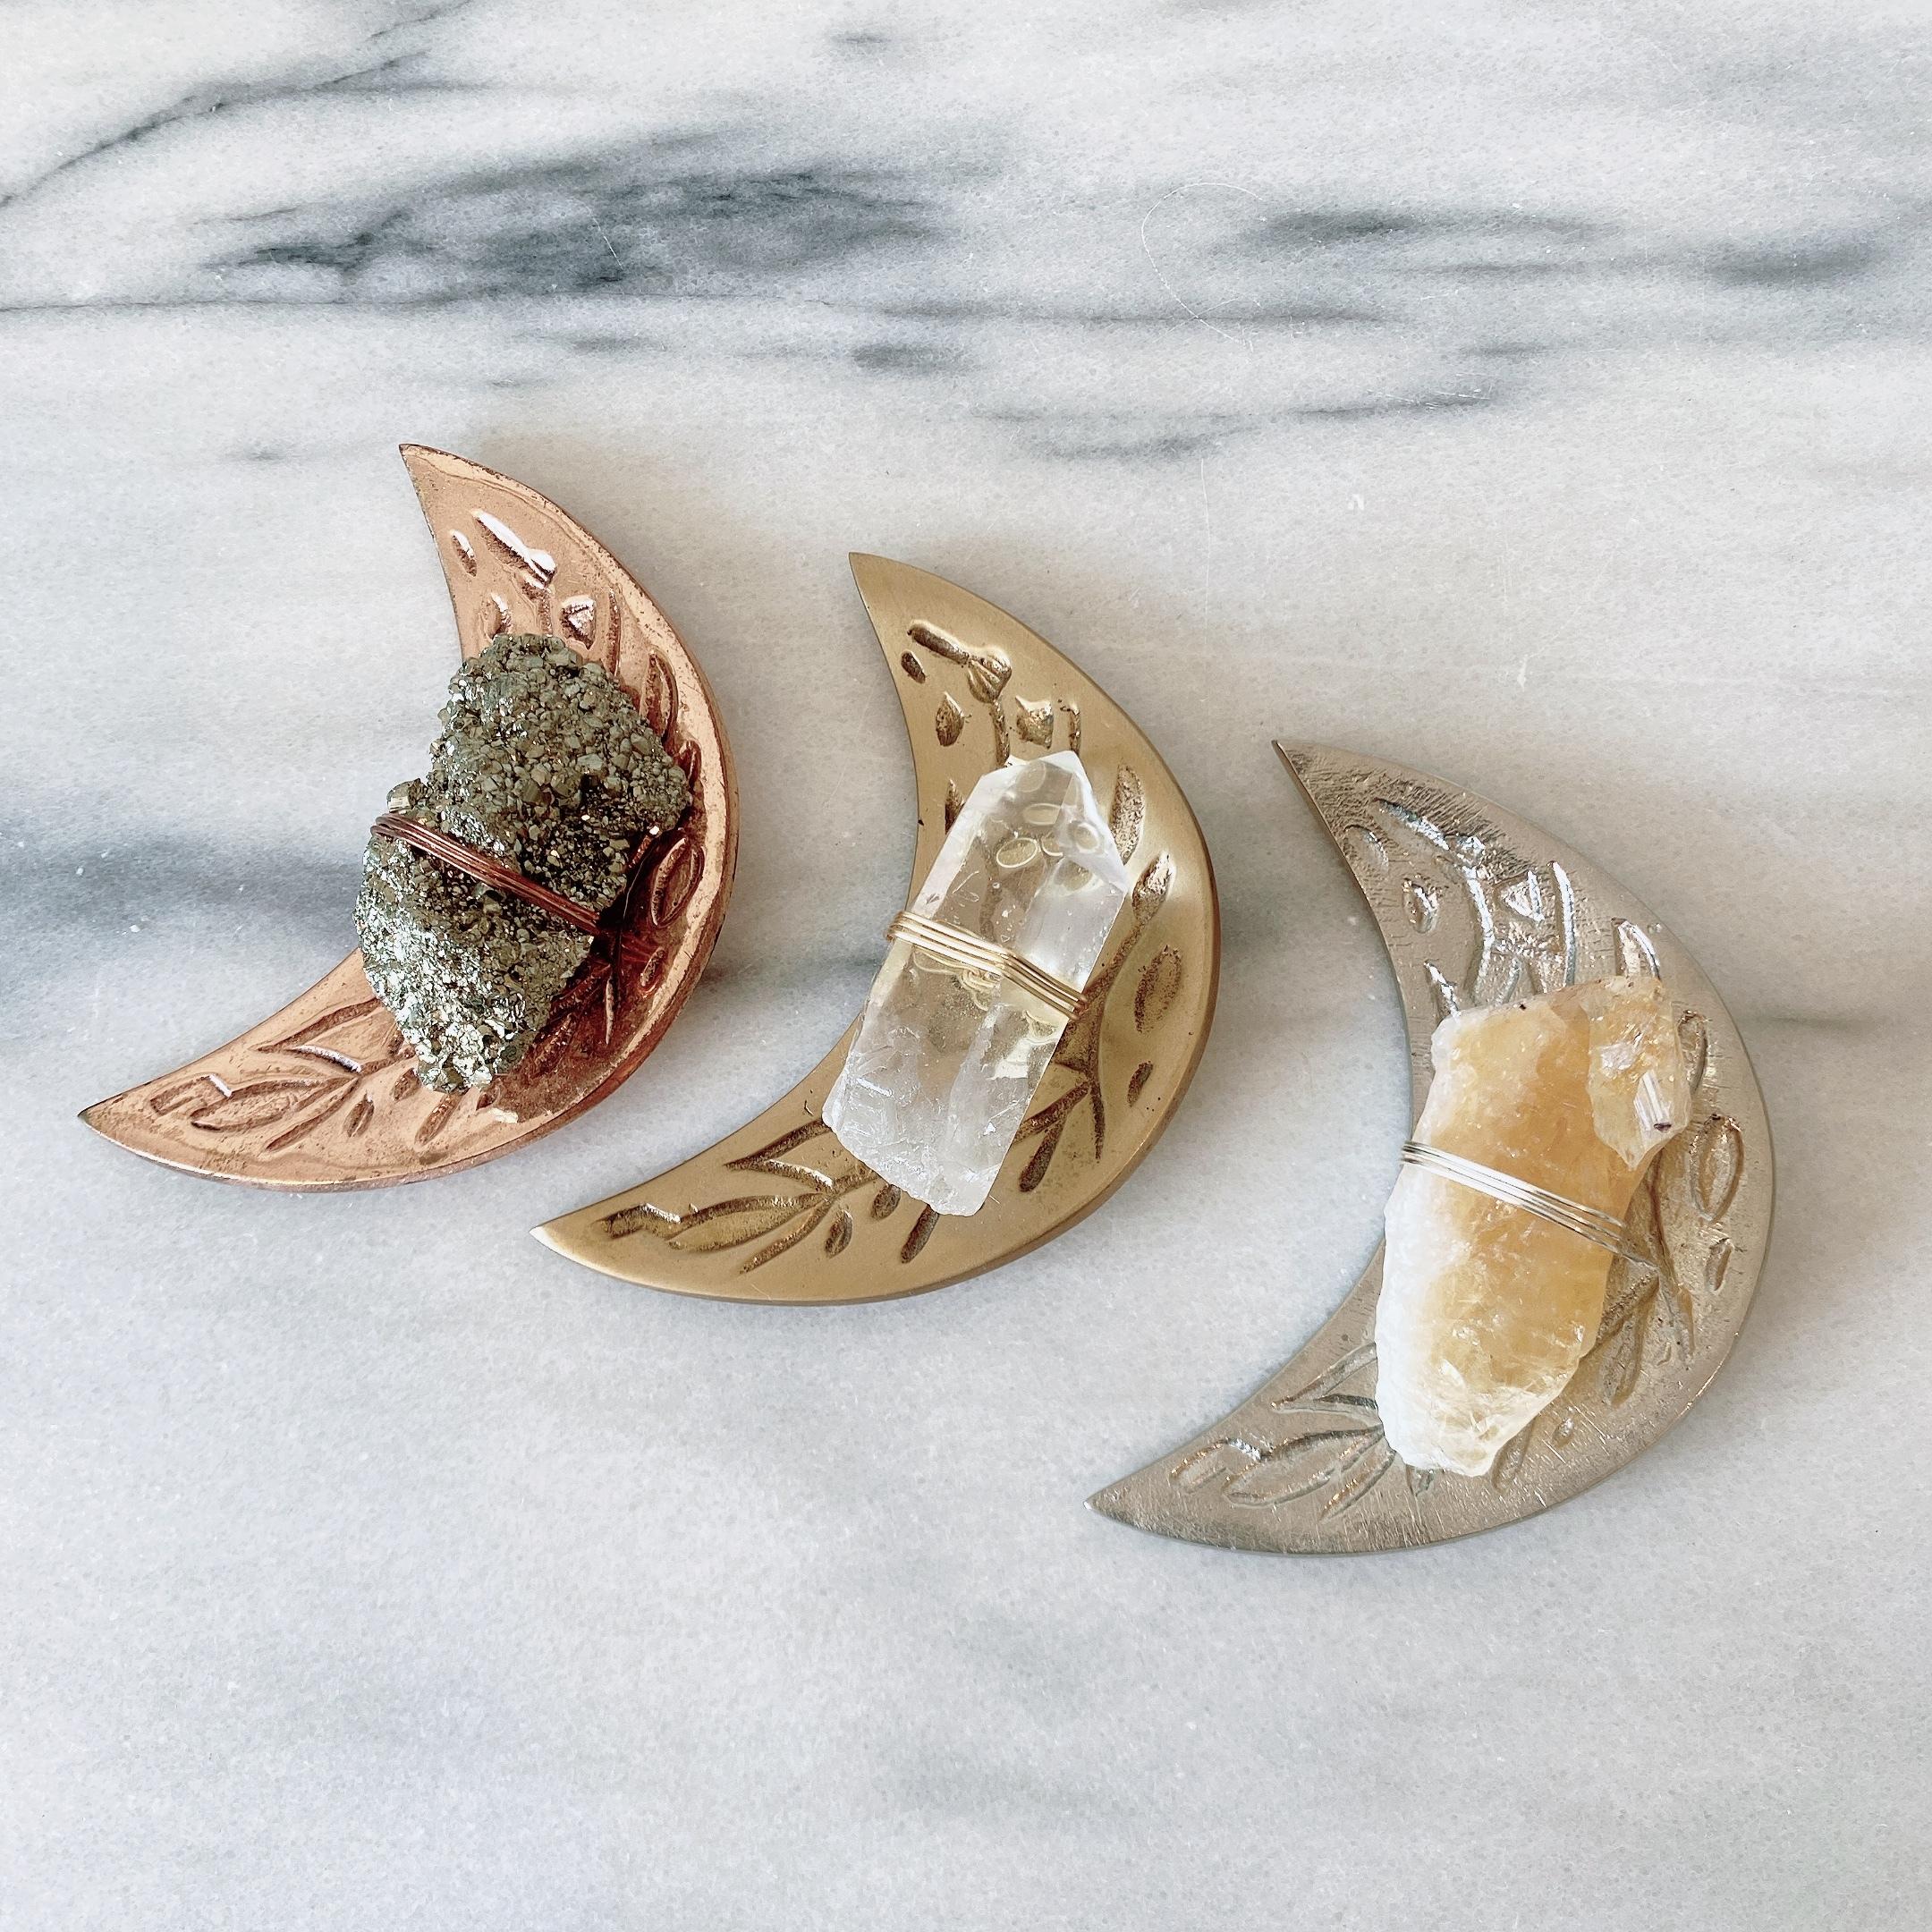 Healing Crystal Moon Dish ヒーリングクリスタルムーンディッシュ